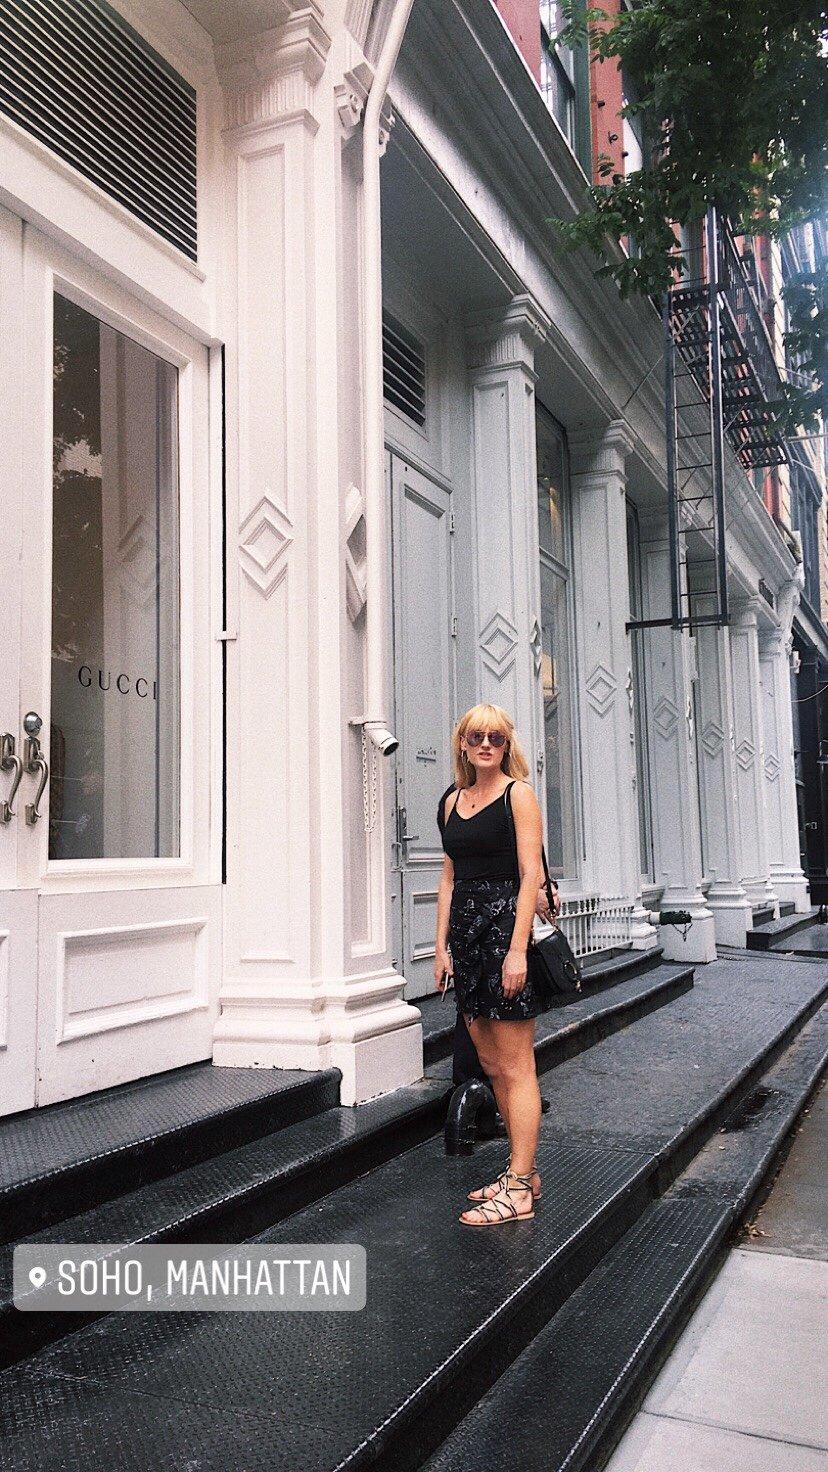 4 Tage in New York City - SoHo Gucci Store - Nowshine Reiseblog ü 40